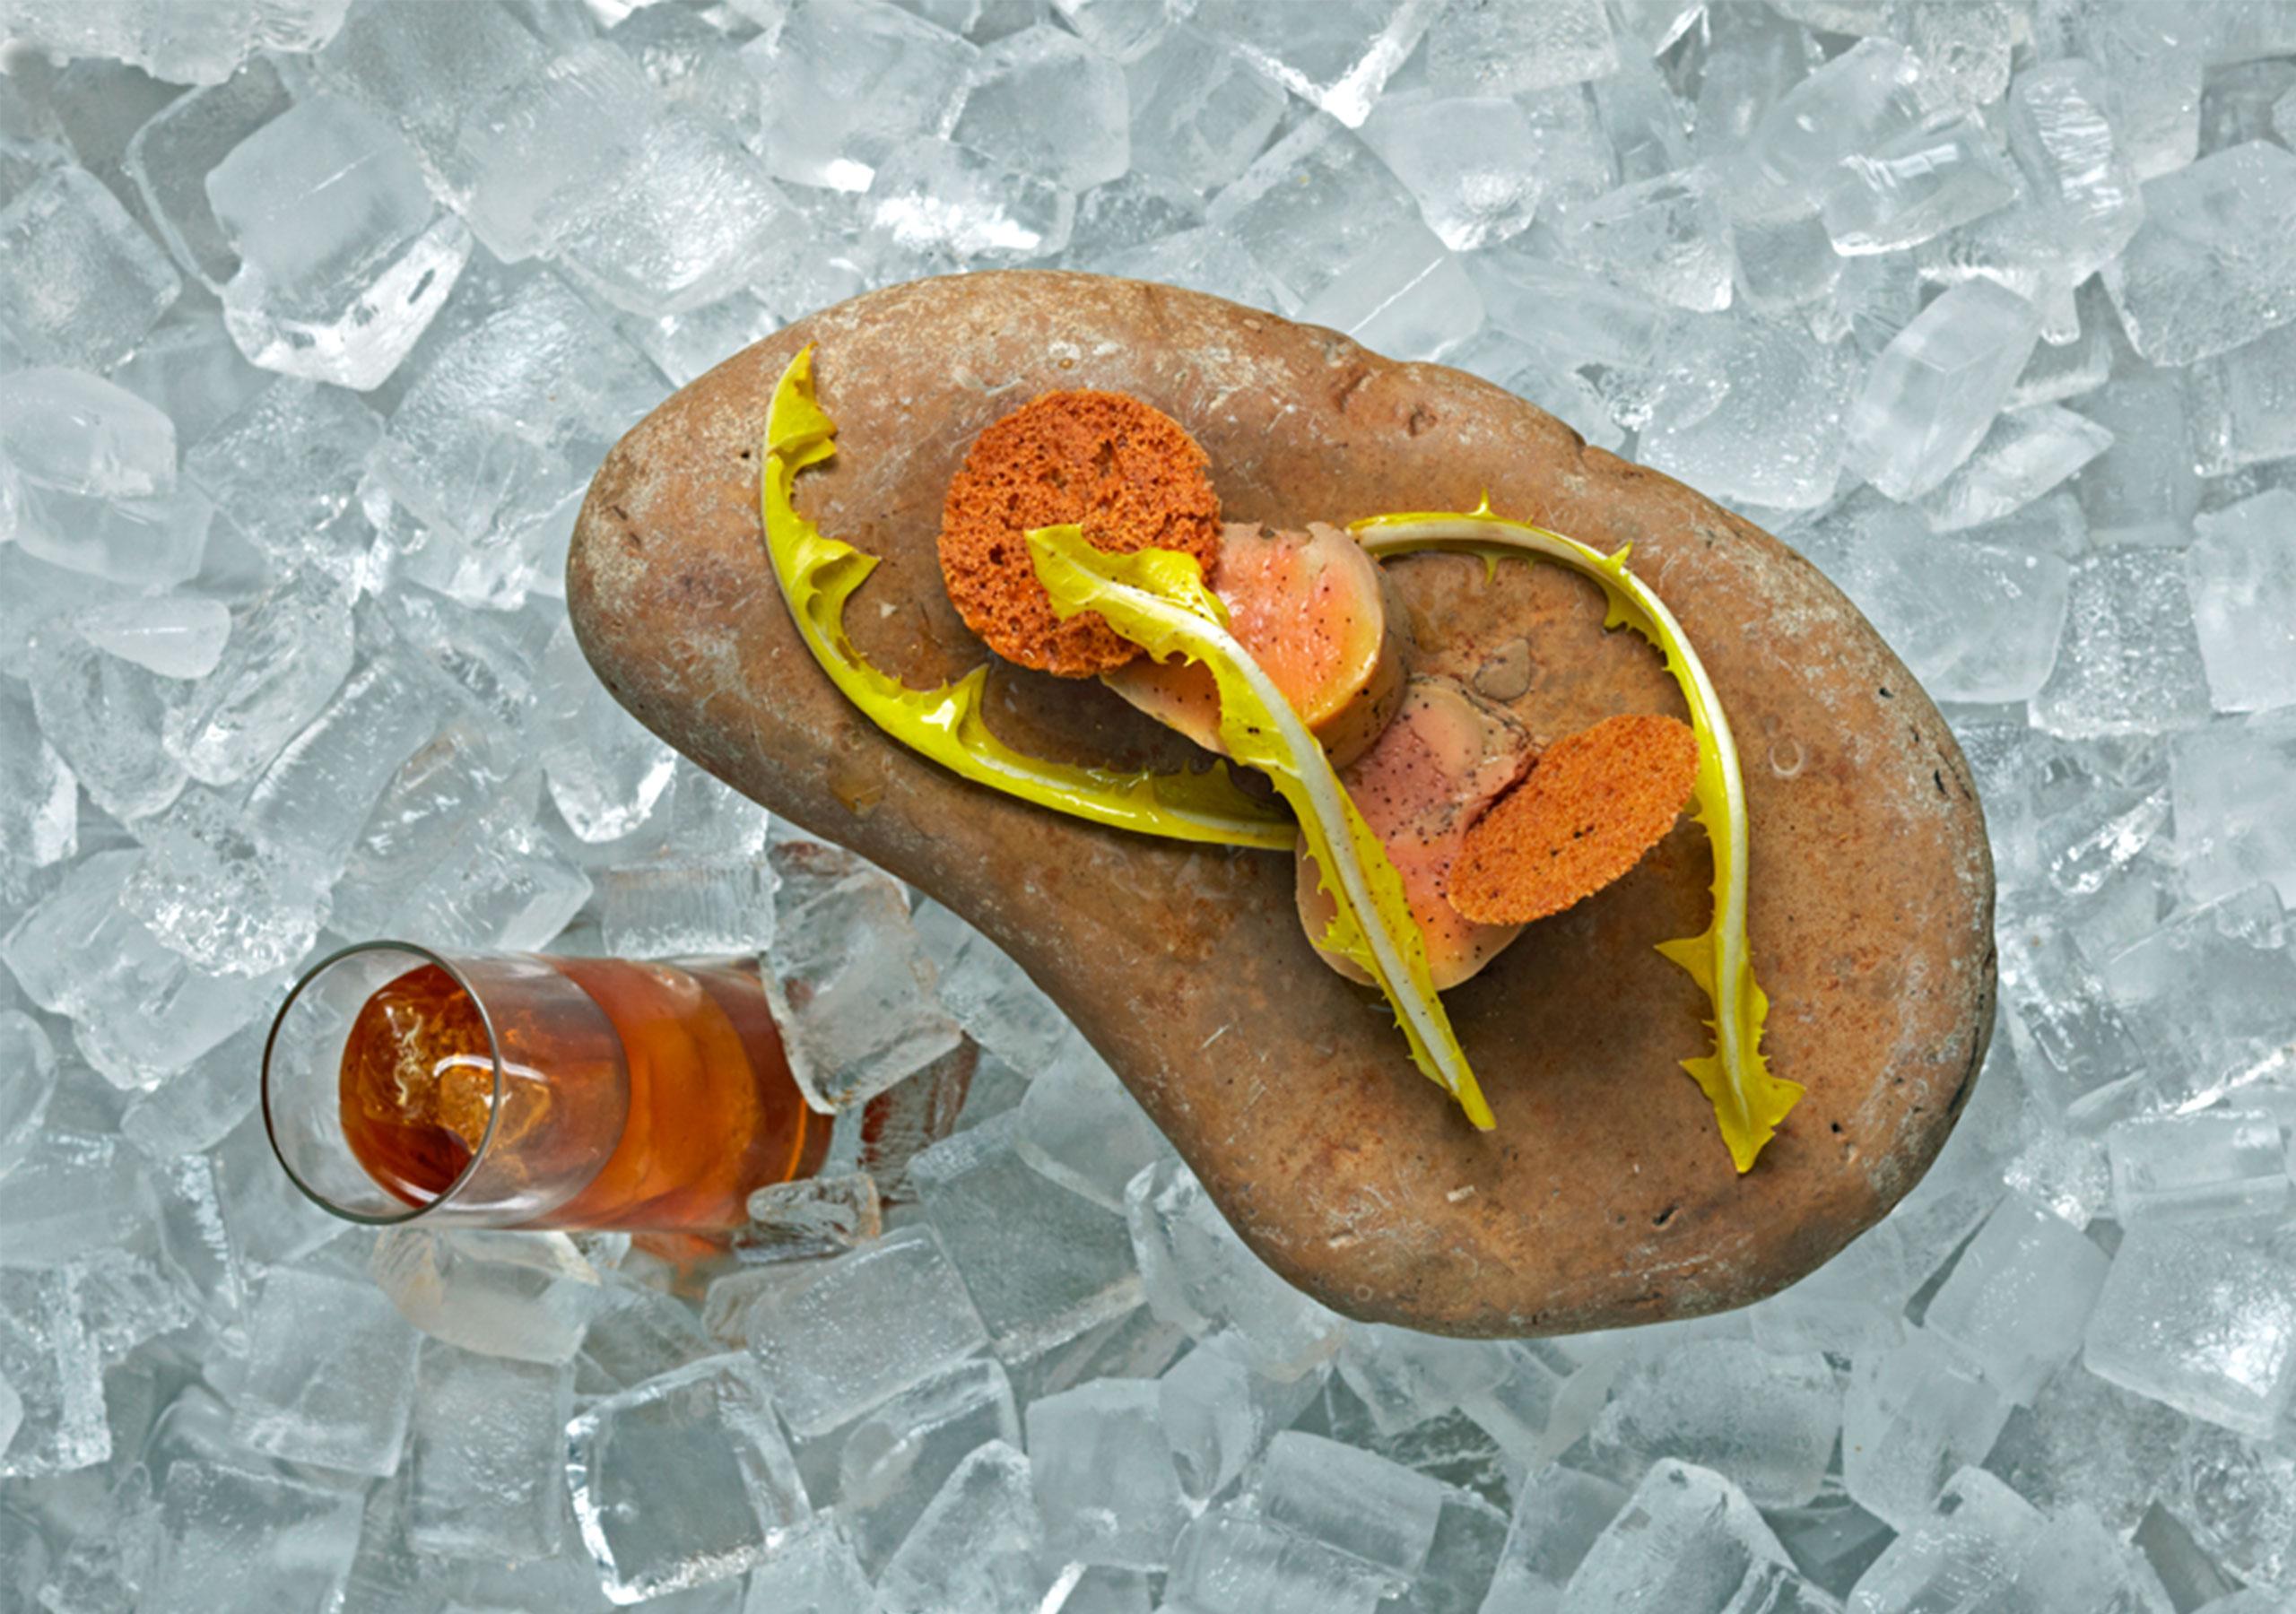 Foie Gras on the Rocks